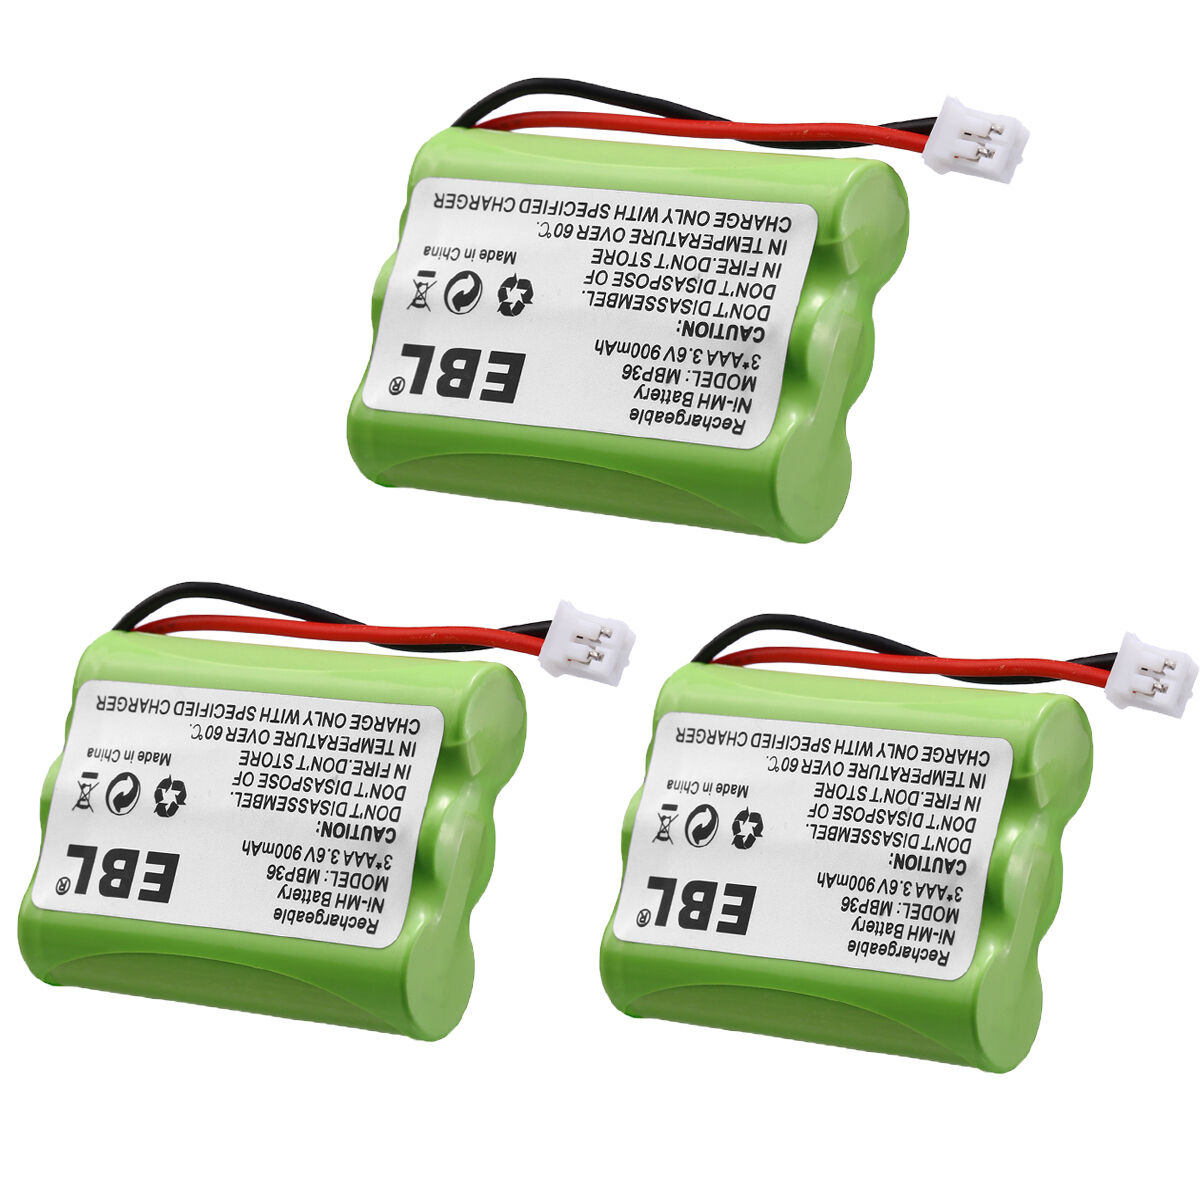 3x 3.6V 900mAh Baby Monitor Battery For Motorola MBP33 MBP36